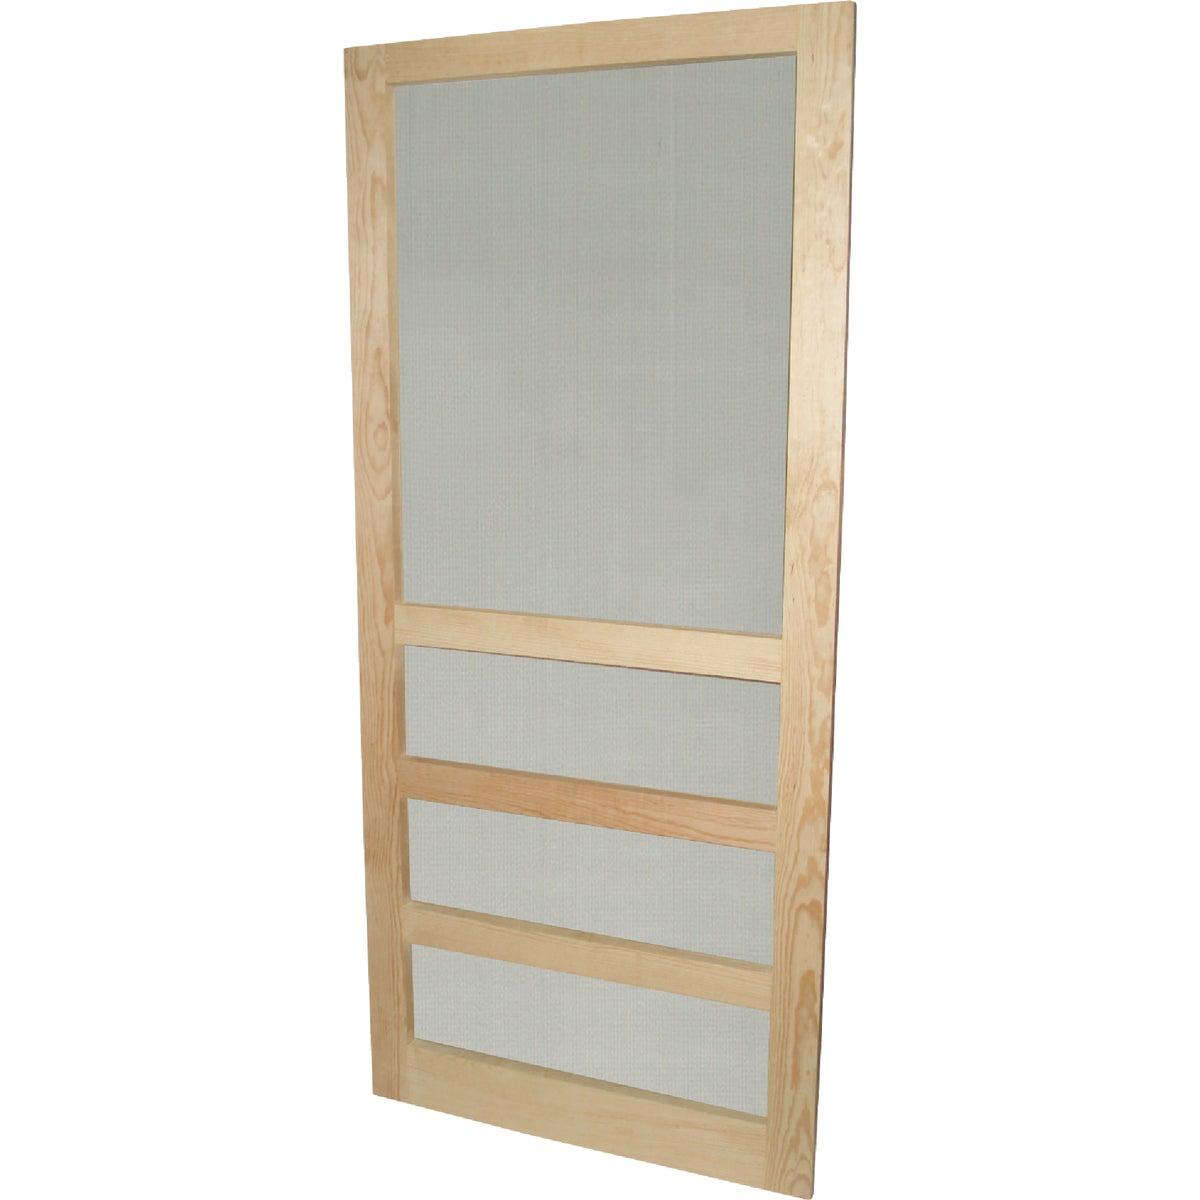 Wood Prod Manufacturers 36